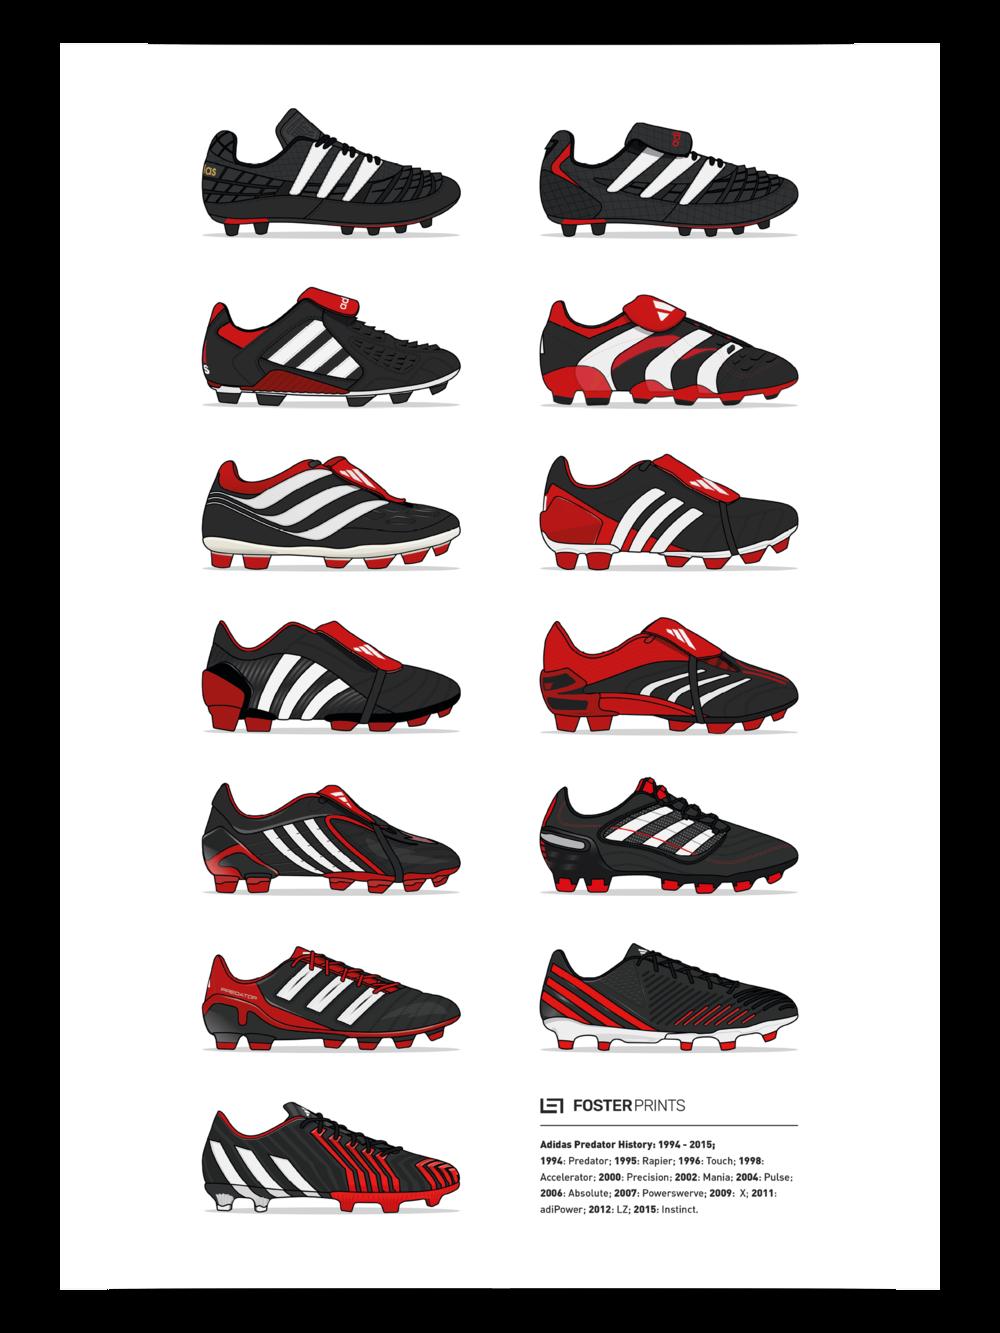 8b4d76b4d ... ireland adidas predator history football poster 1994 2015 u2014 foster  prints 9e076 c25cd